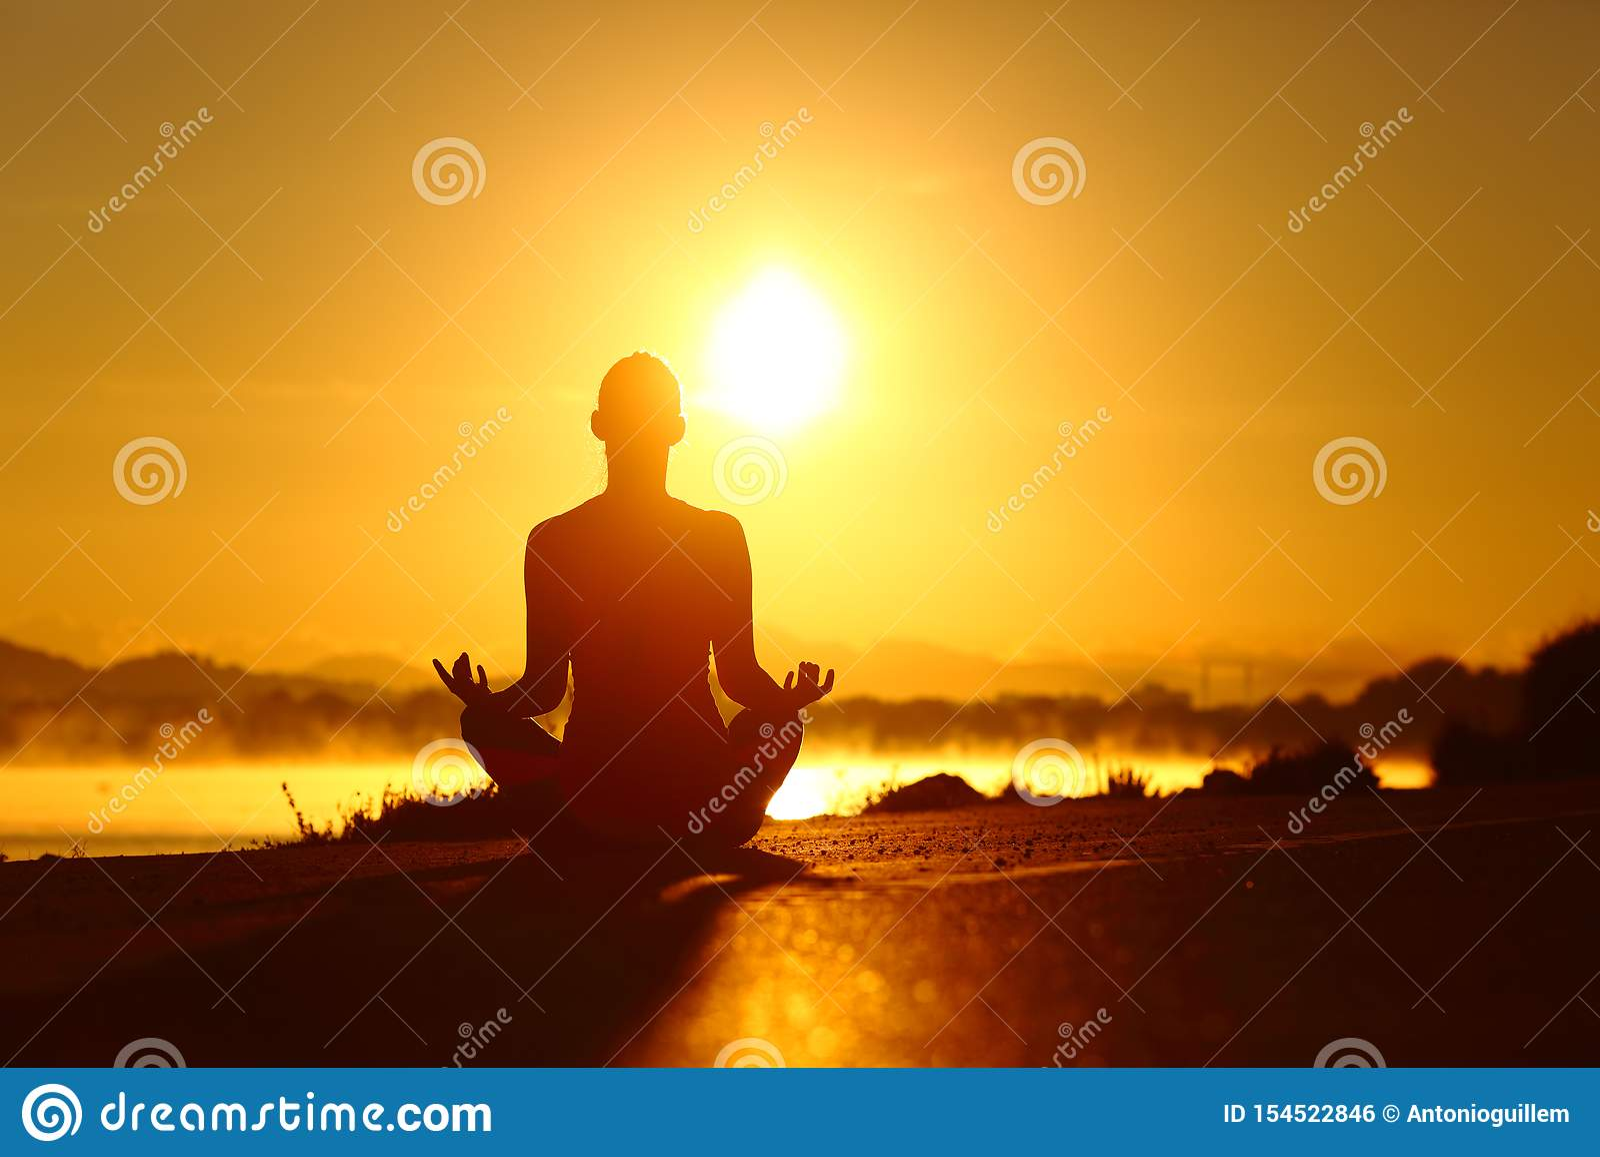 Vrouwensilhouet het praktizeren yogaoefening bij zonsopgang